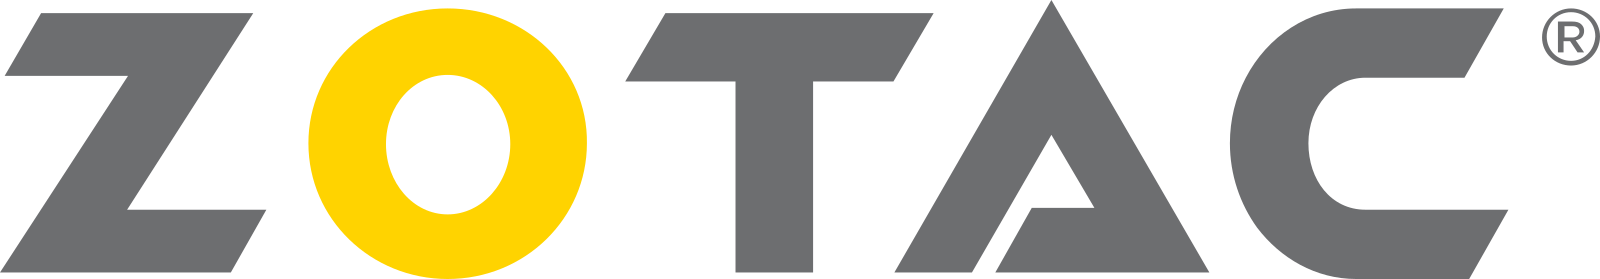 zotac-logo-2